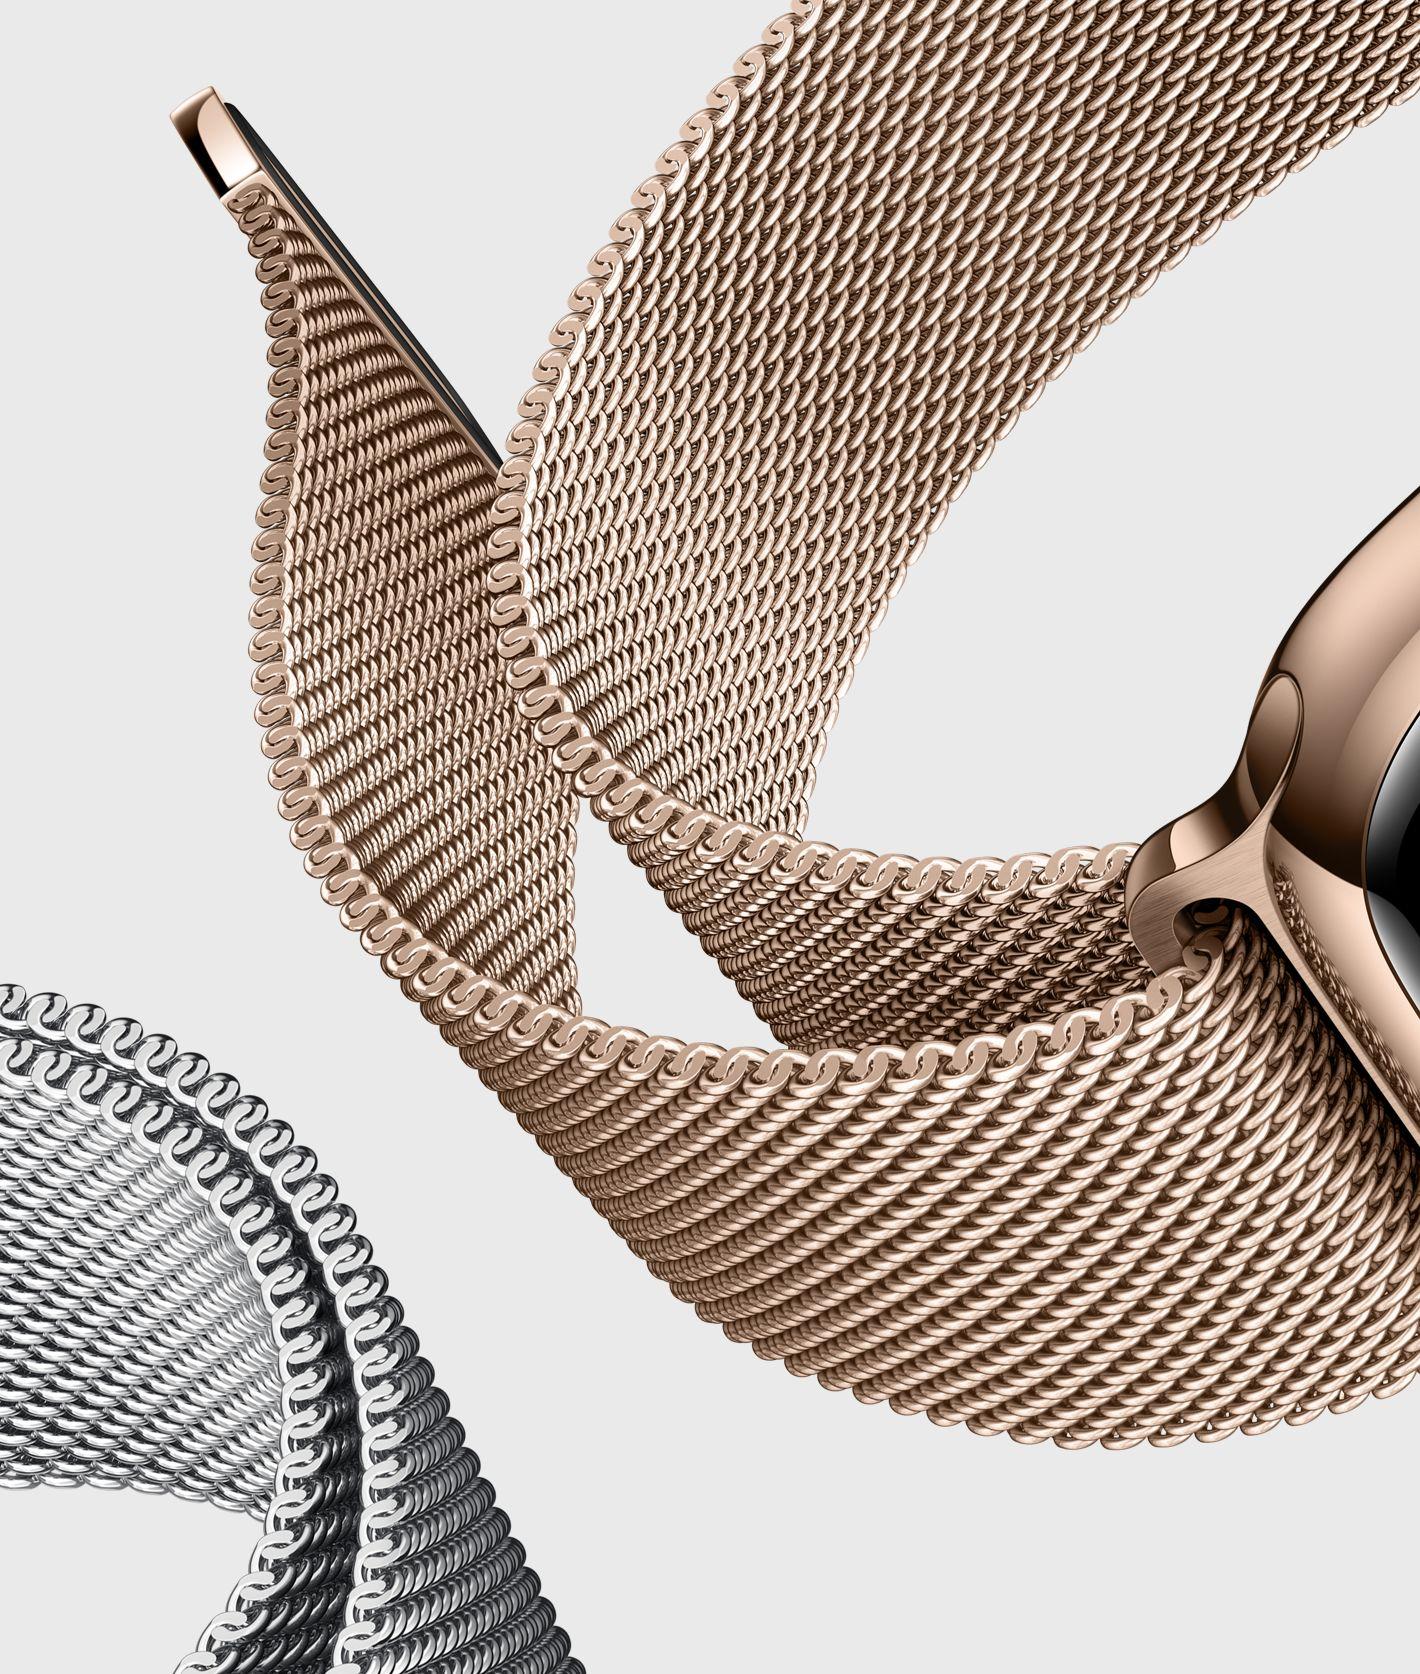 Buy Apple Watch Series 4 Bands